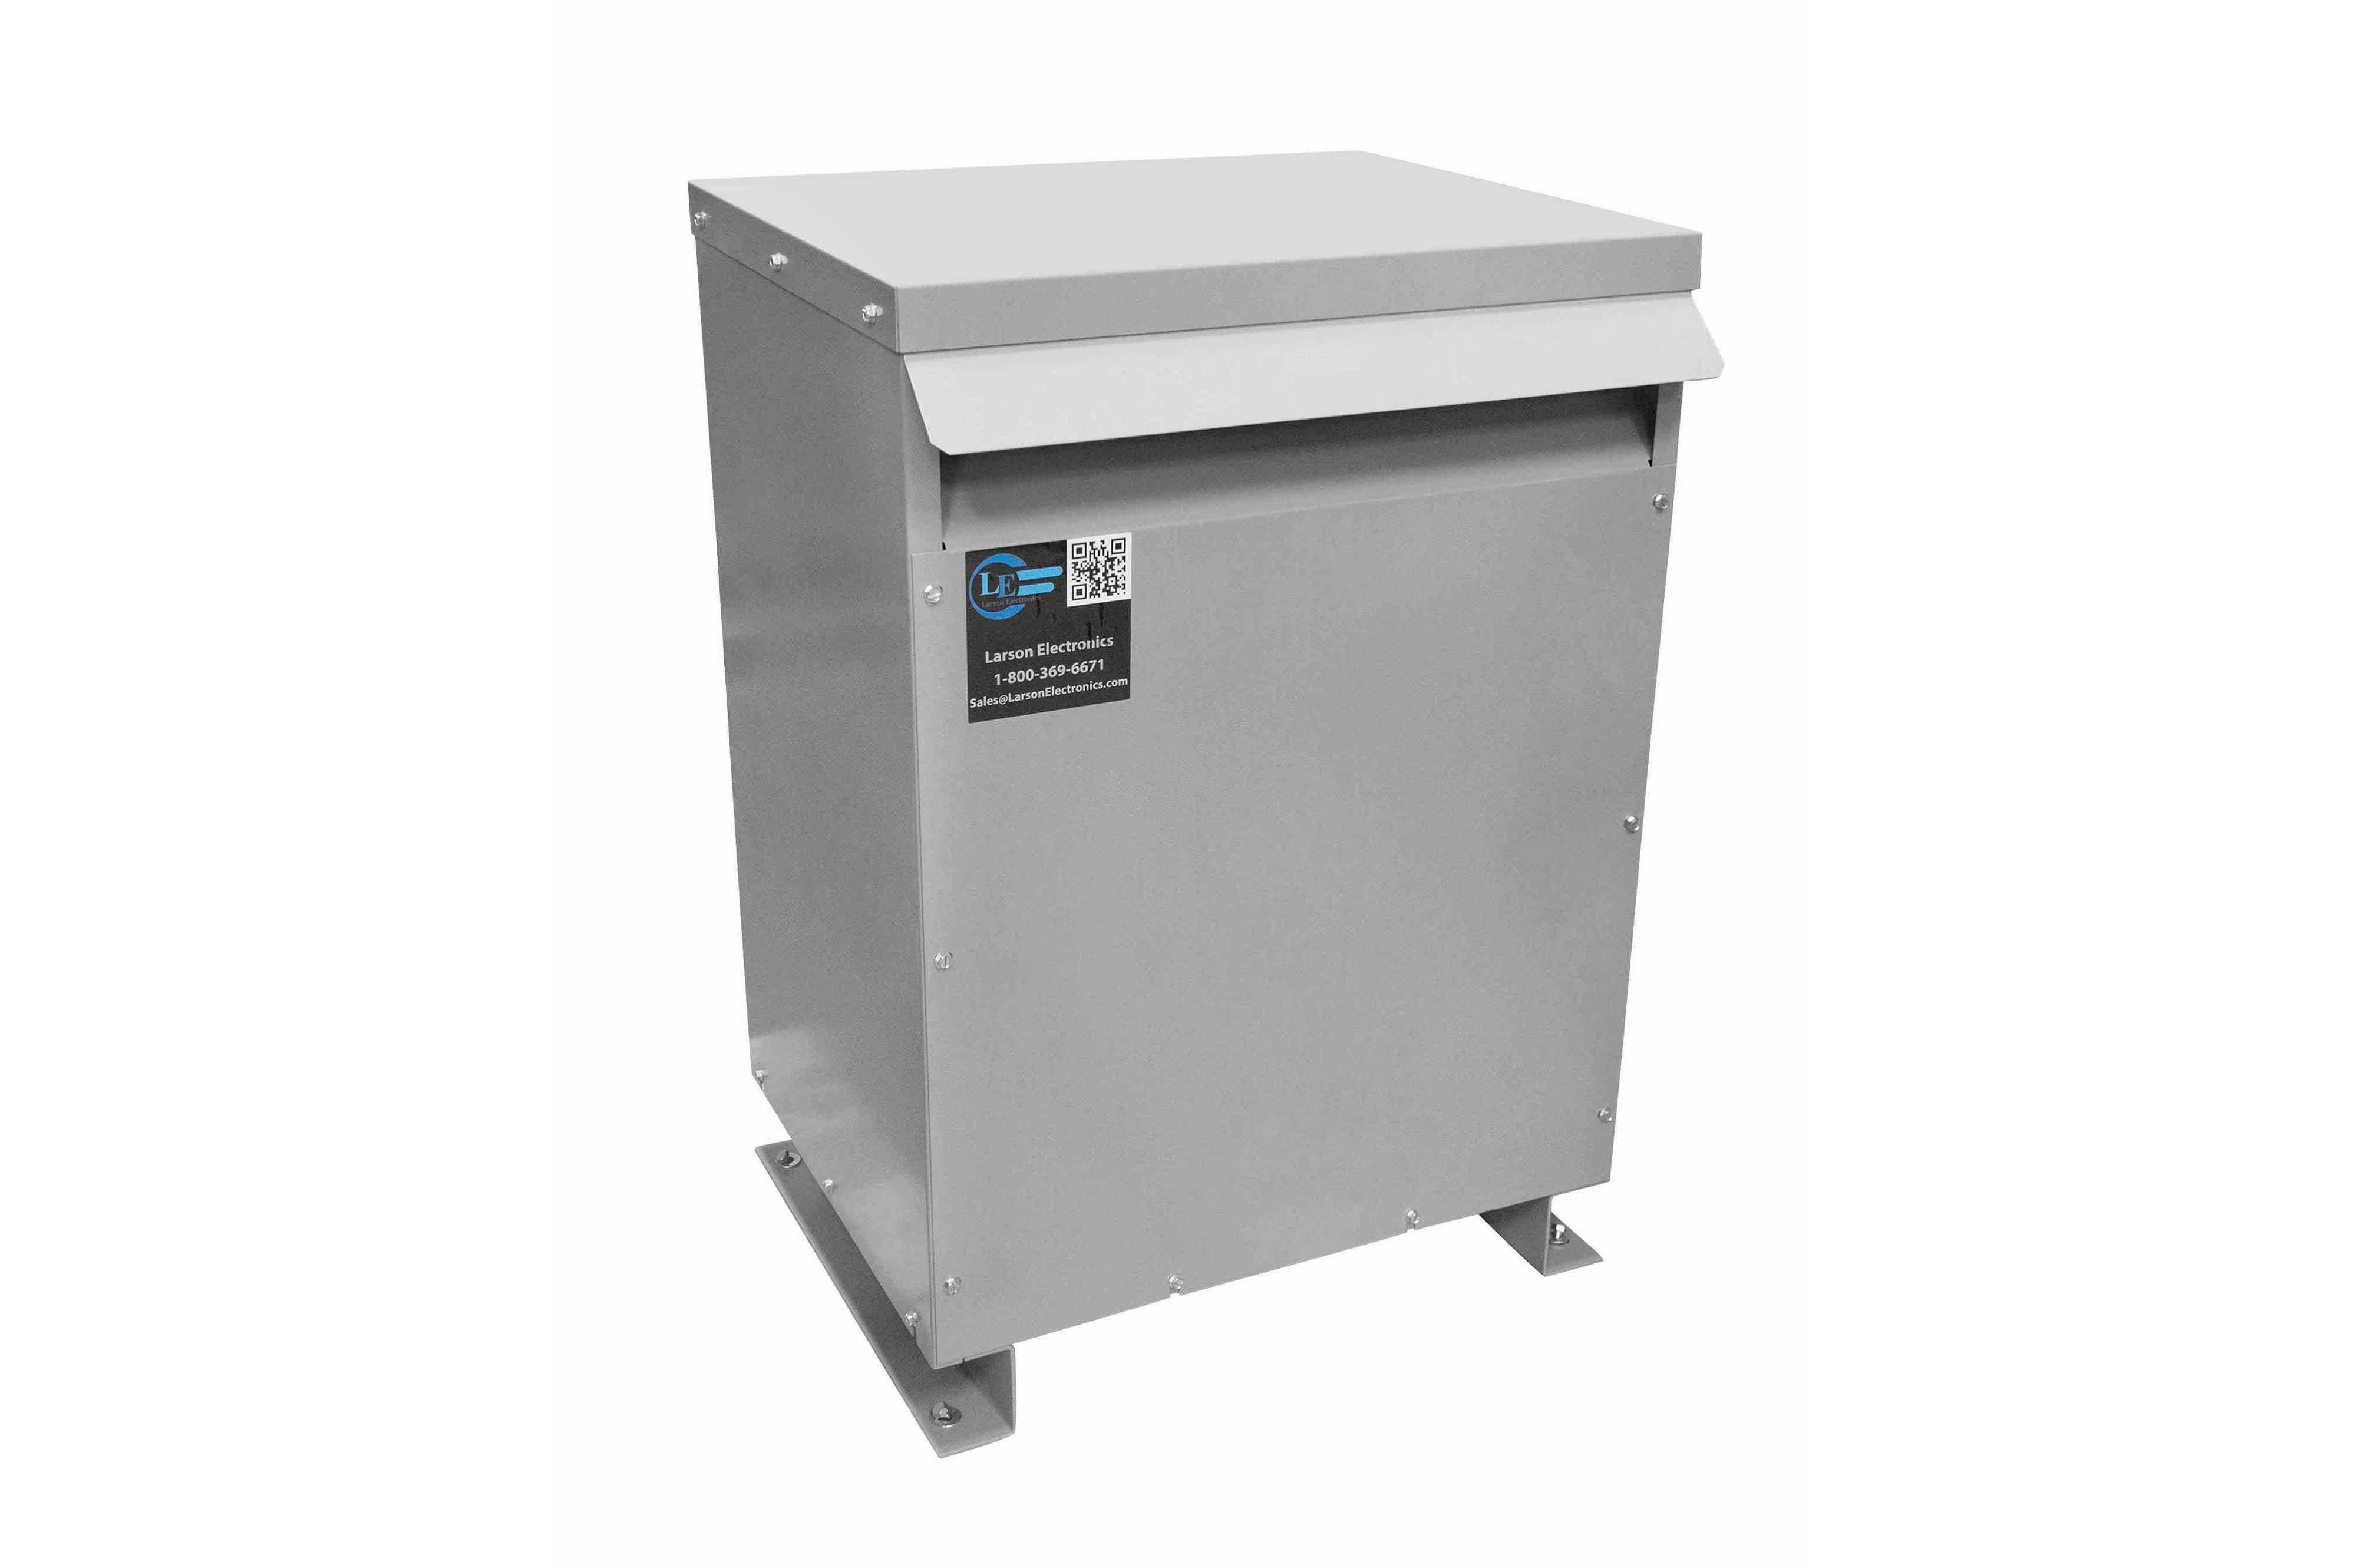 300 kVA 3PH DOE Transformer, 575V Delta Primary, 400Y/231 Wye-N Secondary, N3R, Ventilated, 60 Hz